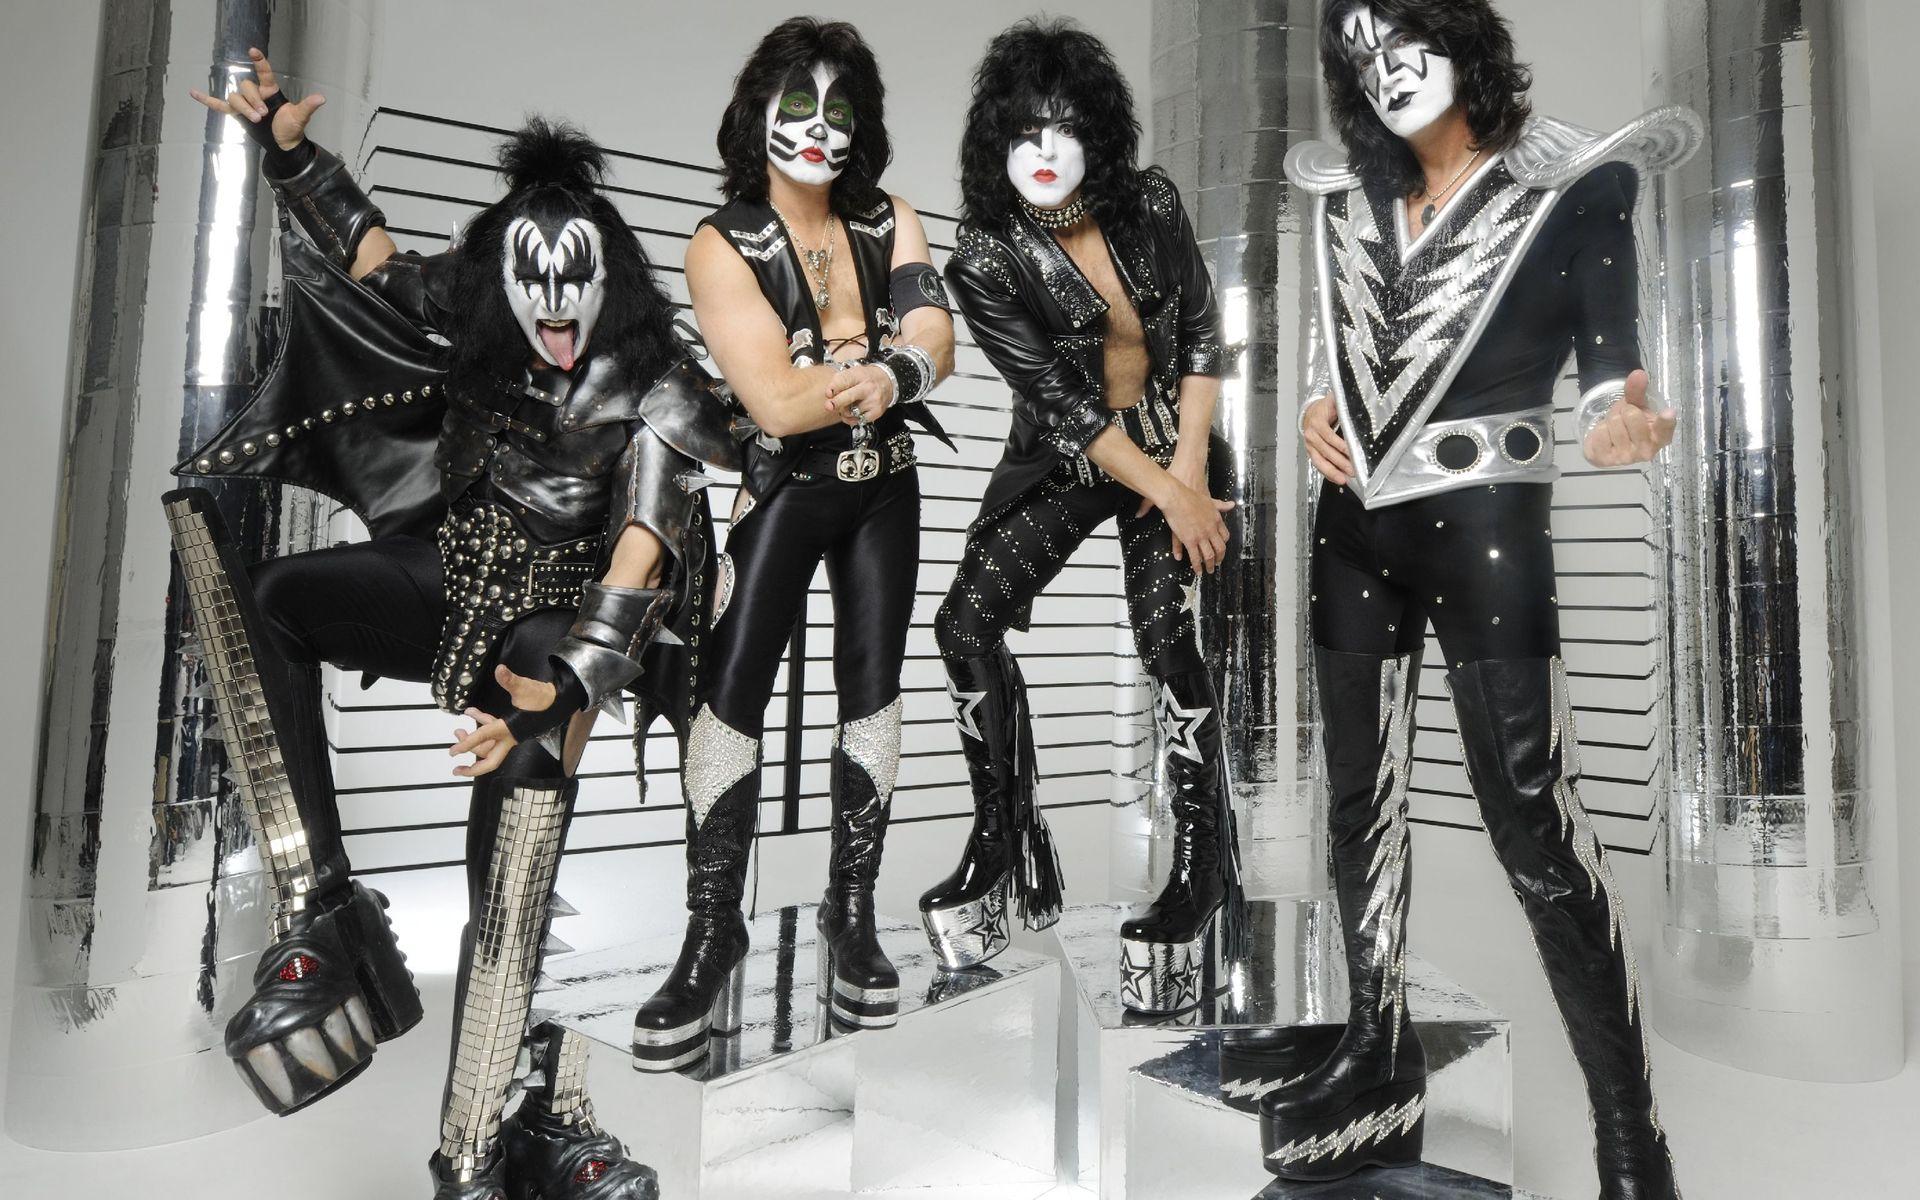 The Legends of Rock reúne Kiss e Scorpions em Oeiras